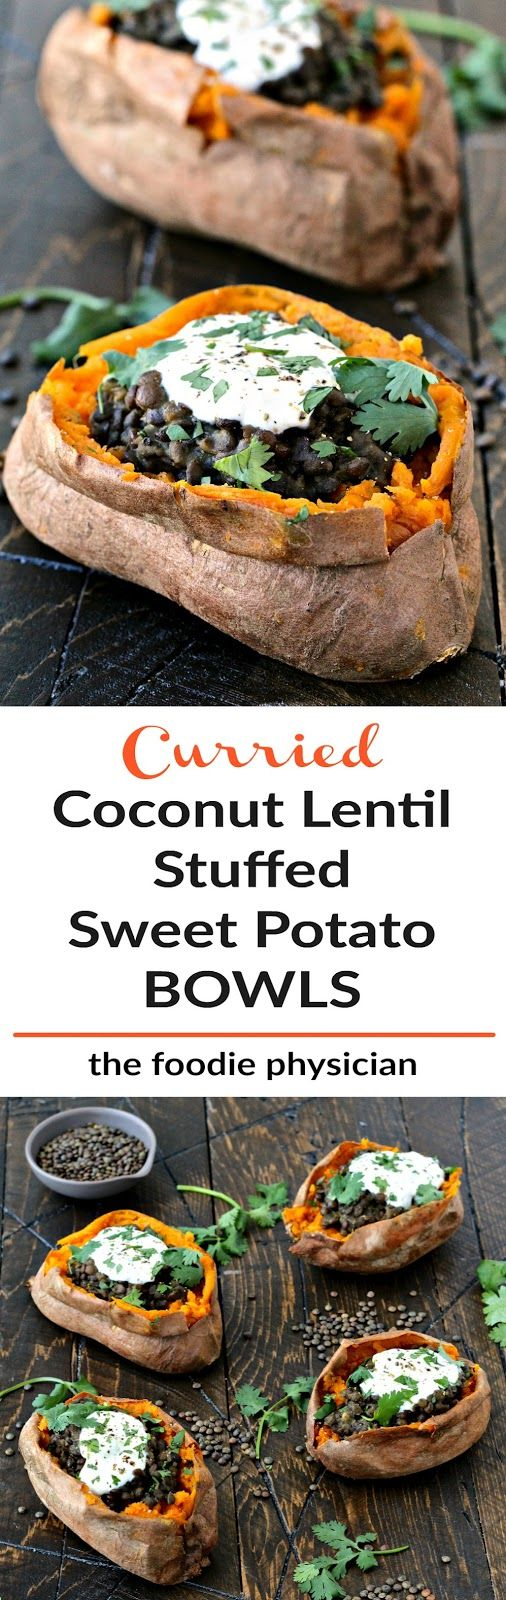 ... Sweet Potato Curry on Pinterest | Potato Curry, Potatoes and Lentils